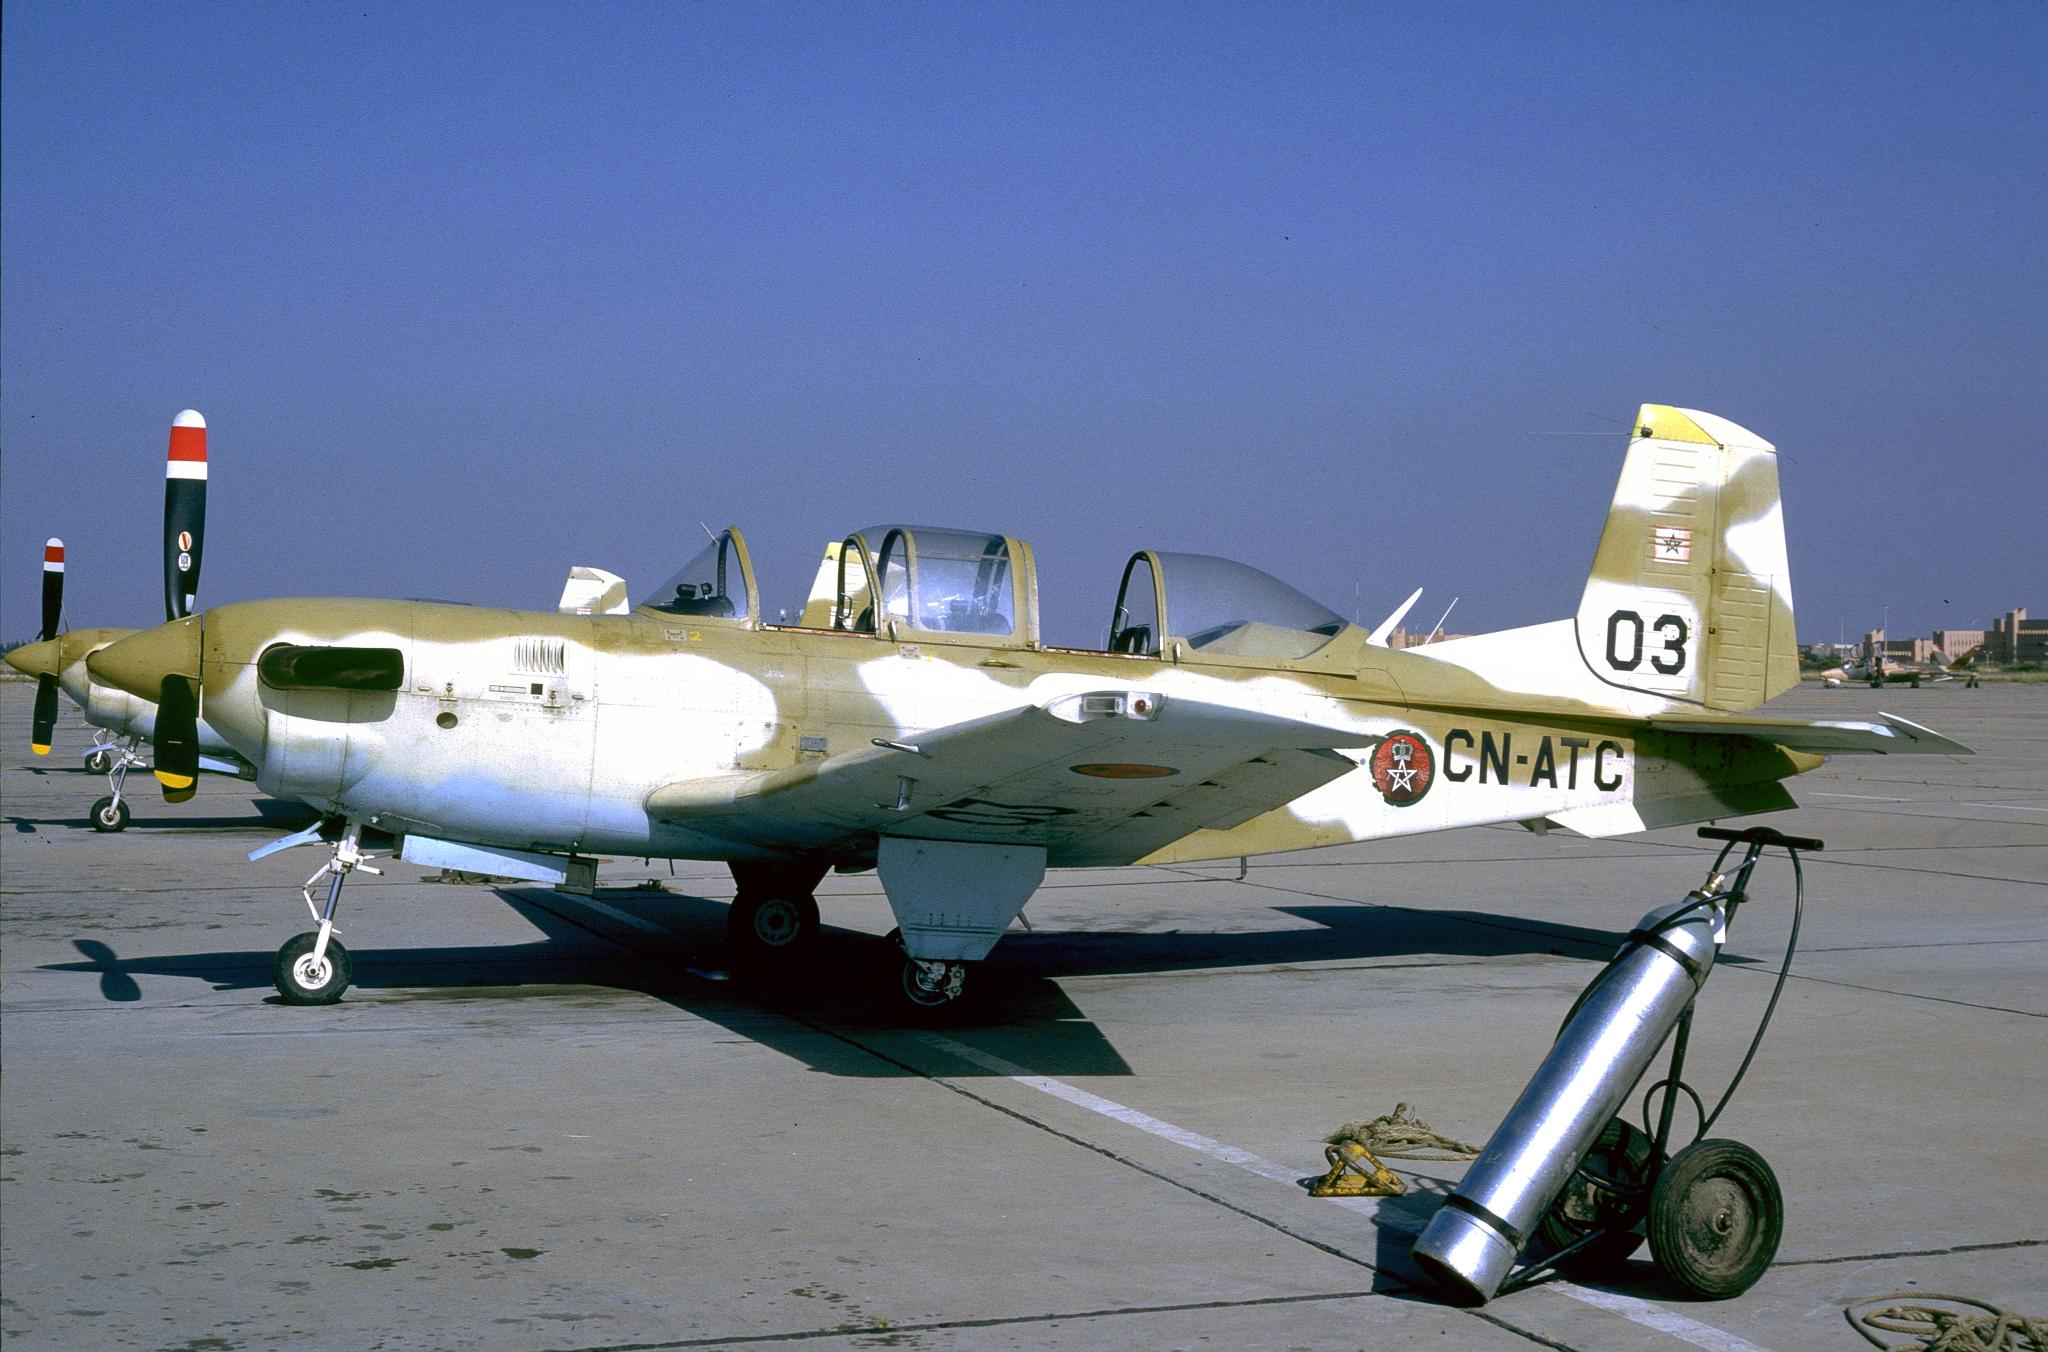 FRA: Photos anciens avions des FRA - Page 7 151226025349462085